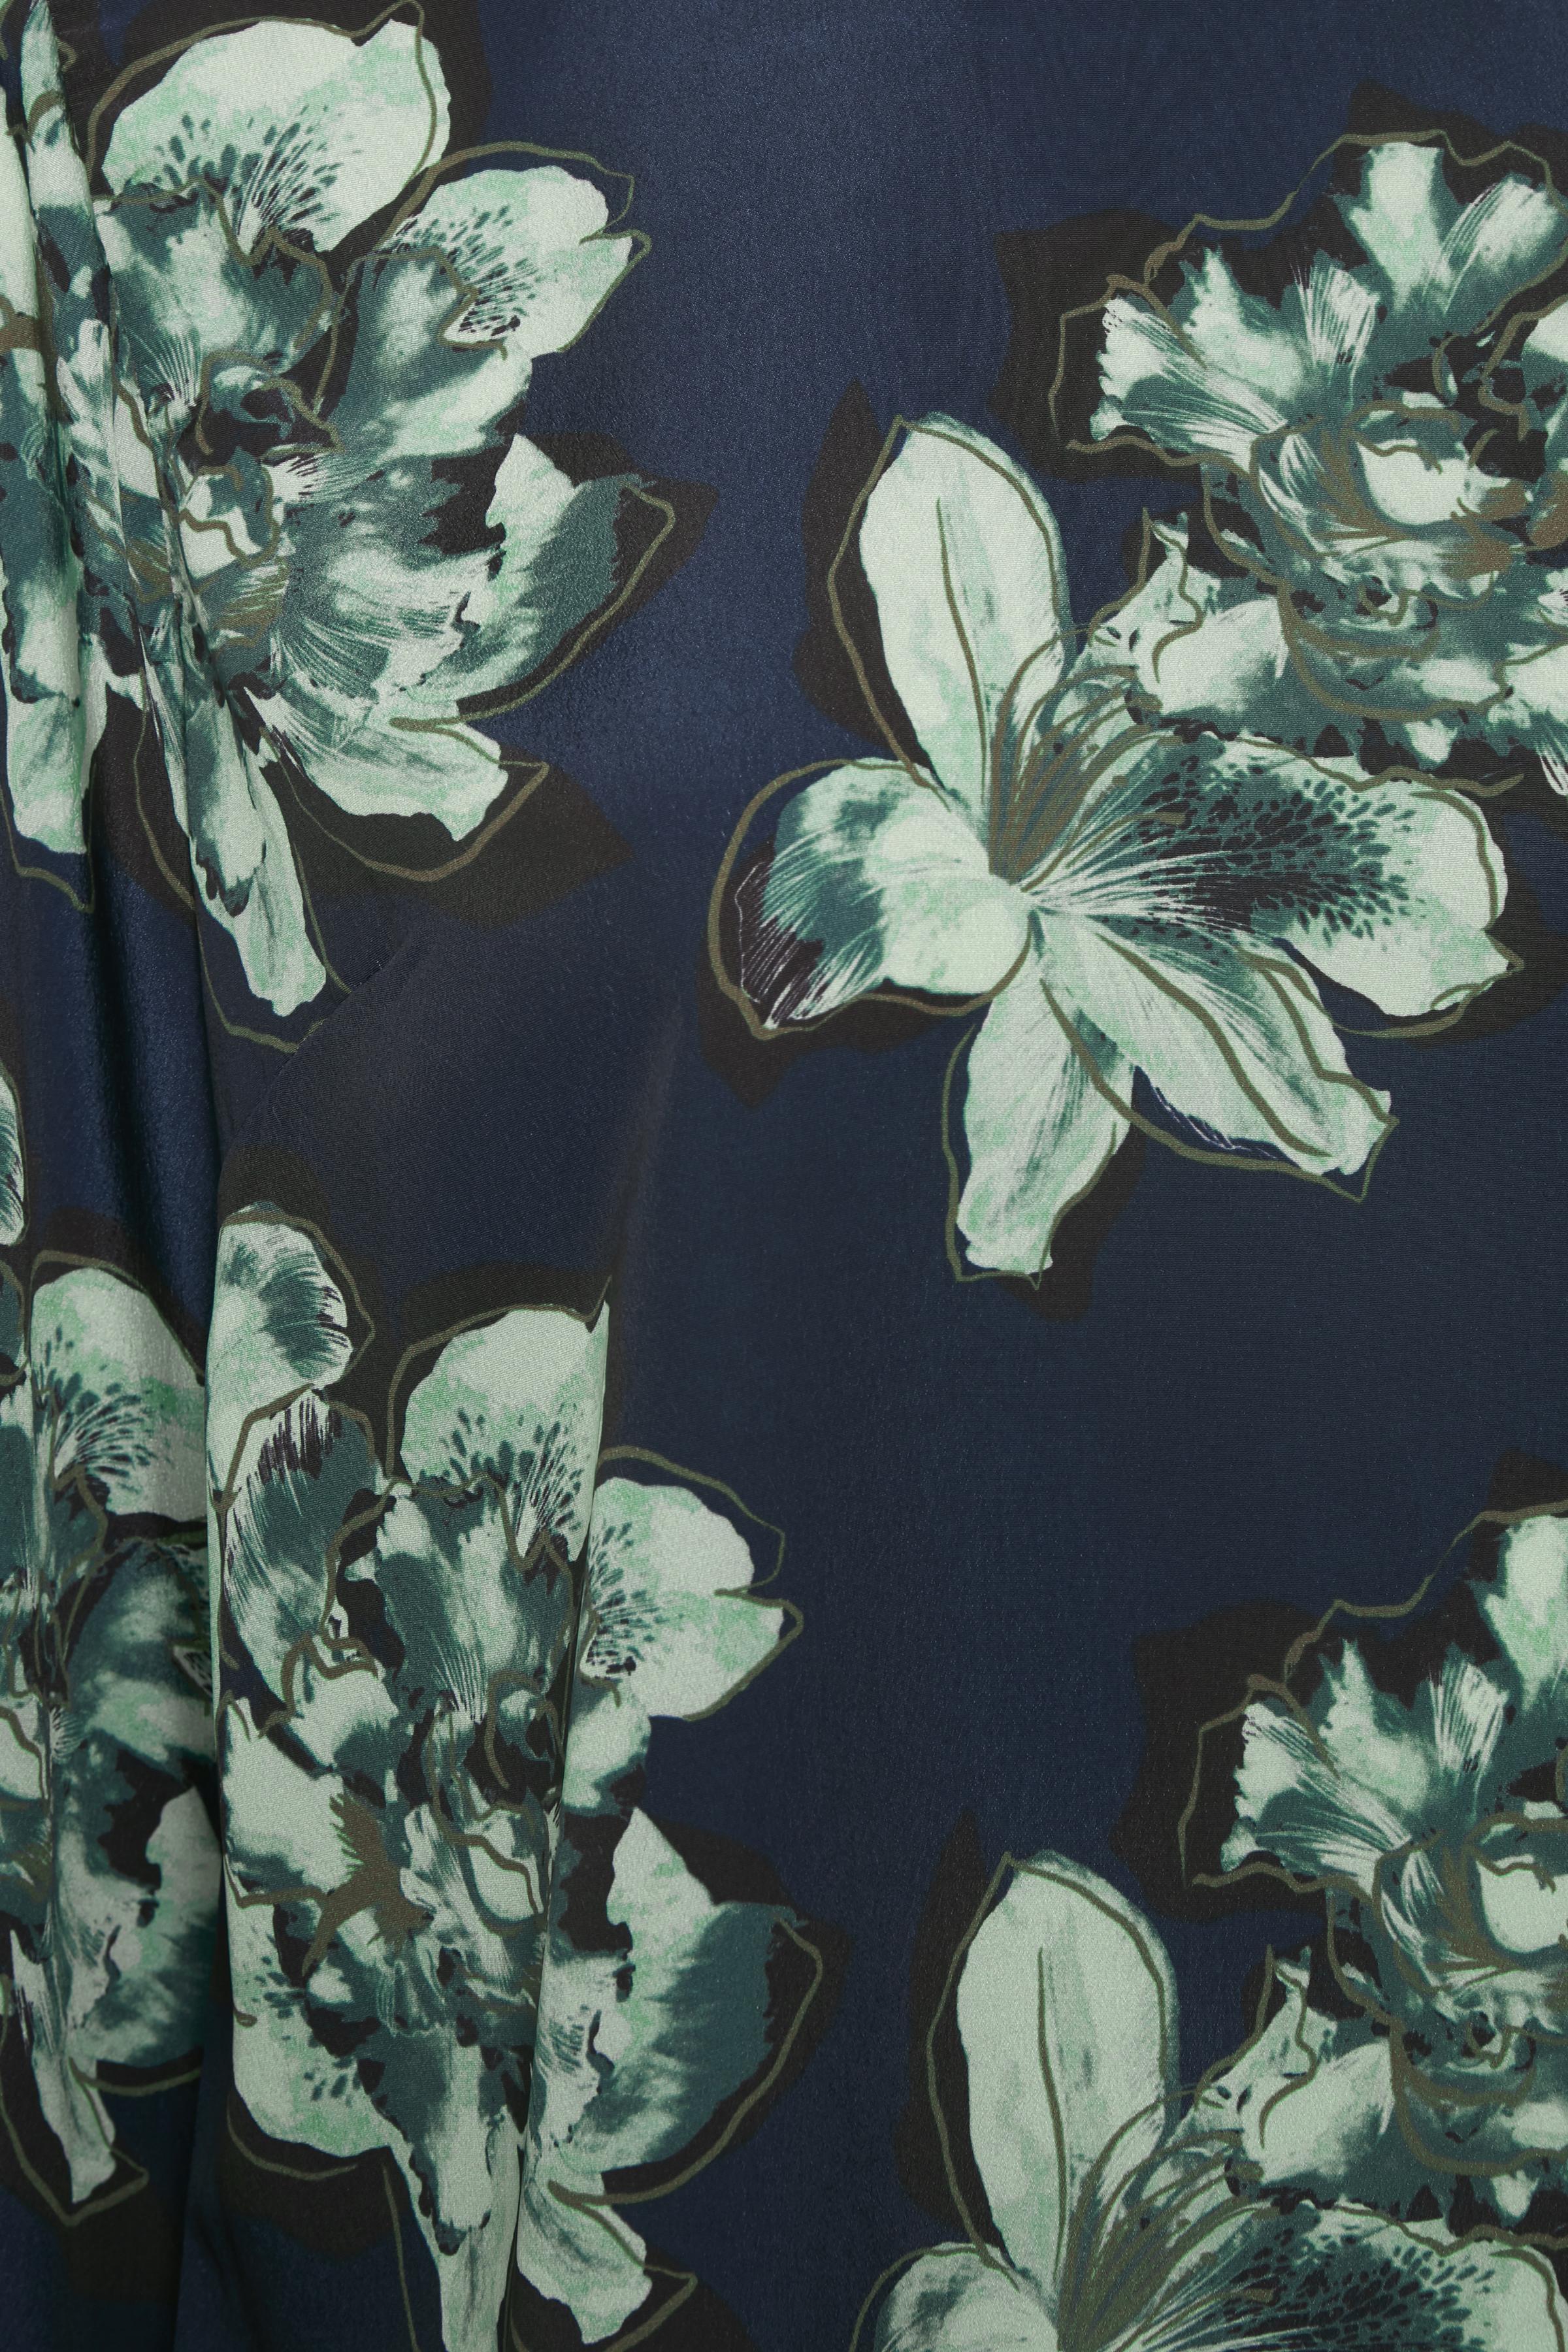 Marinblå/grön Långärmad blus från Bon'A Parte – Köp Marinblå/grön Långärmad blus från stl. S-2XL här